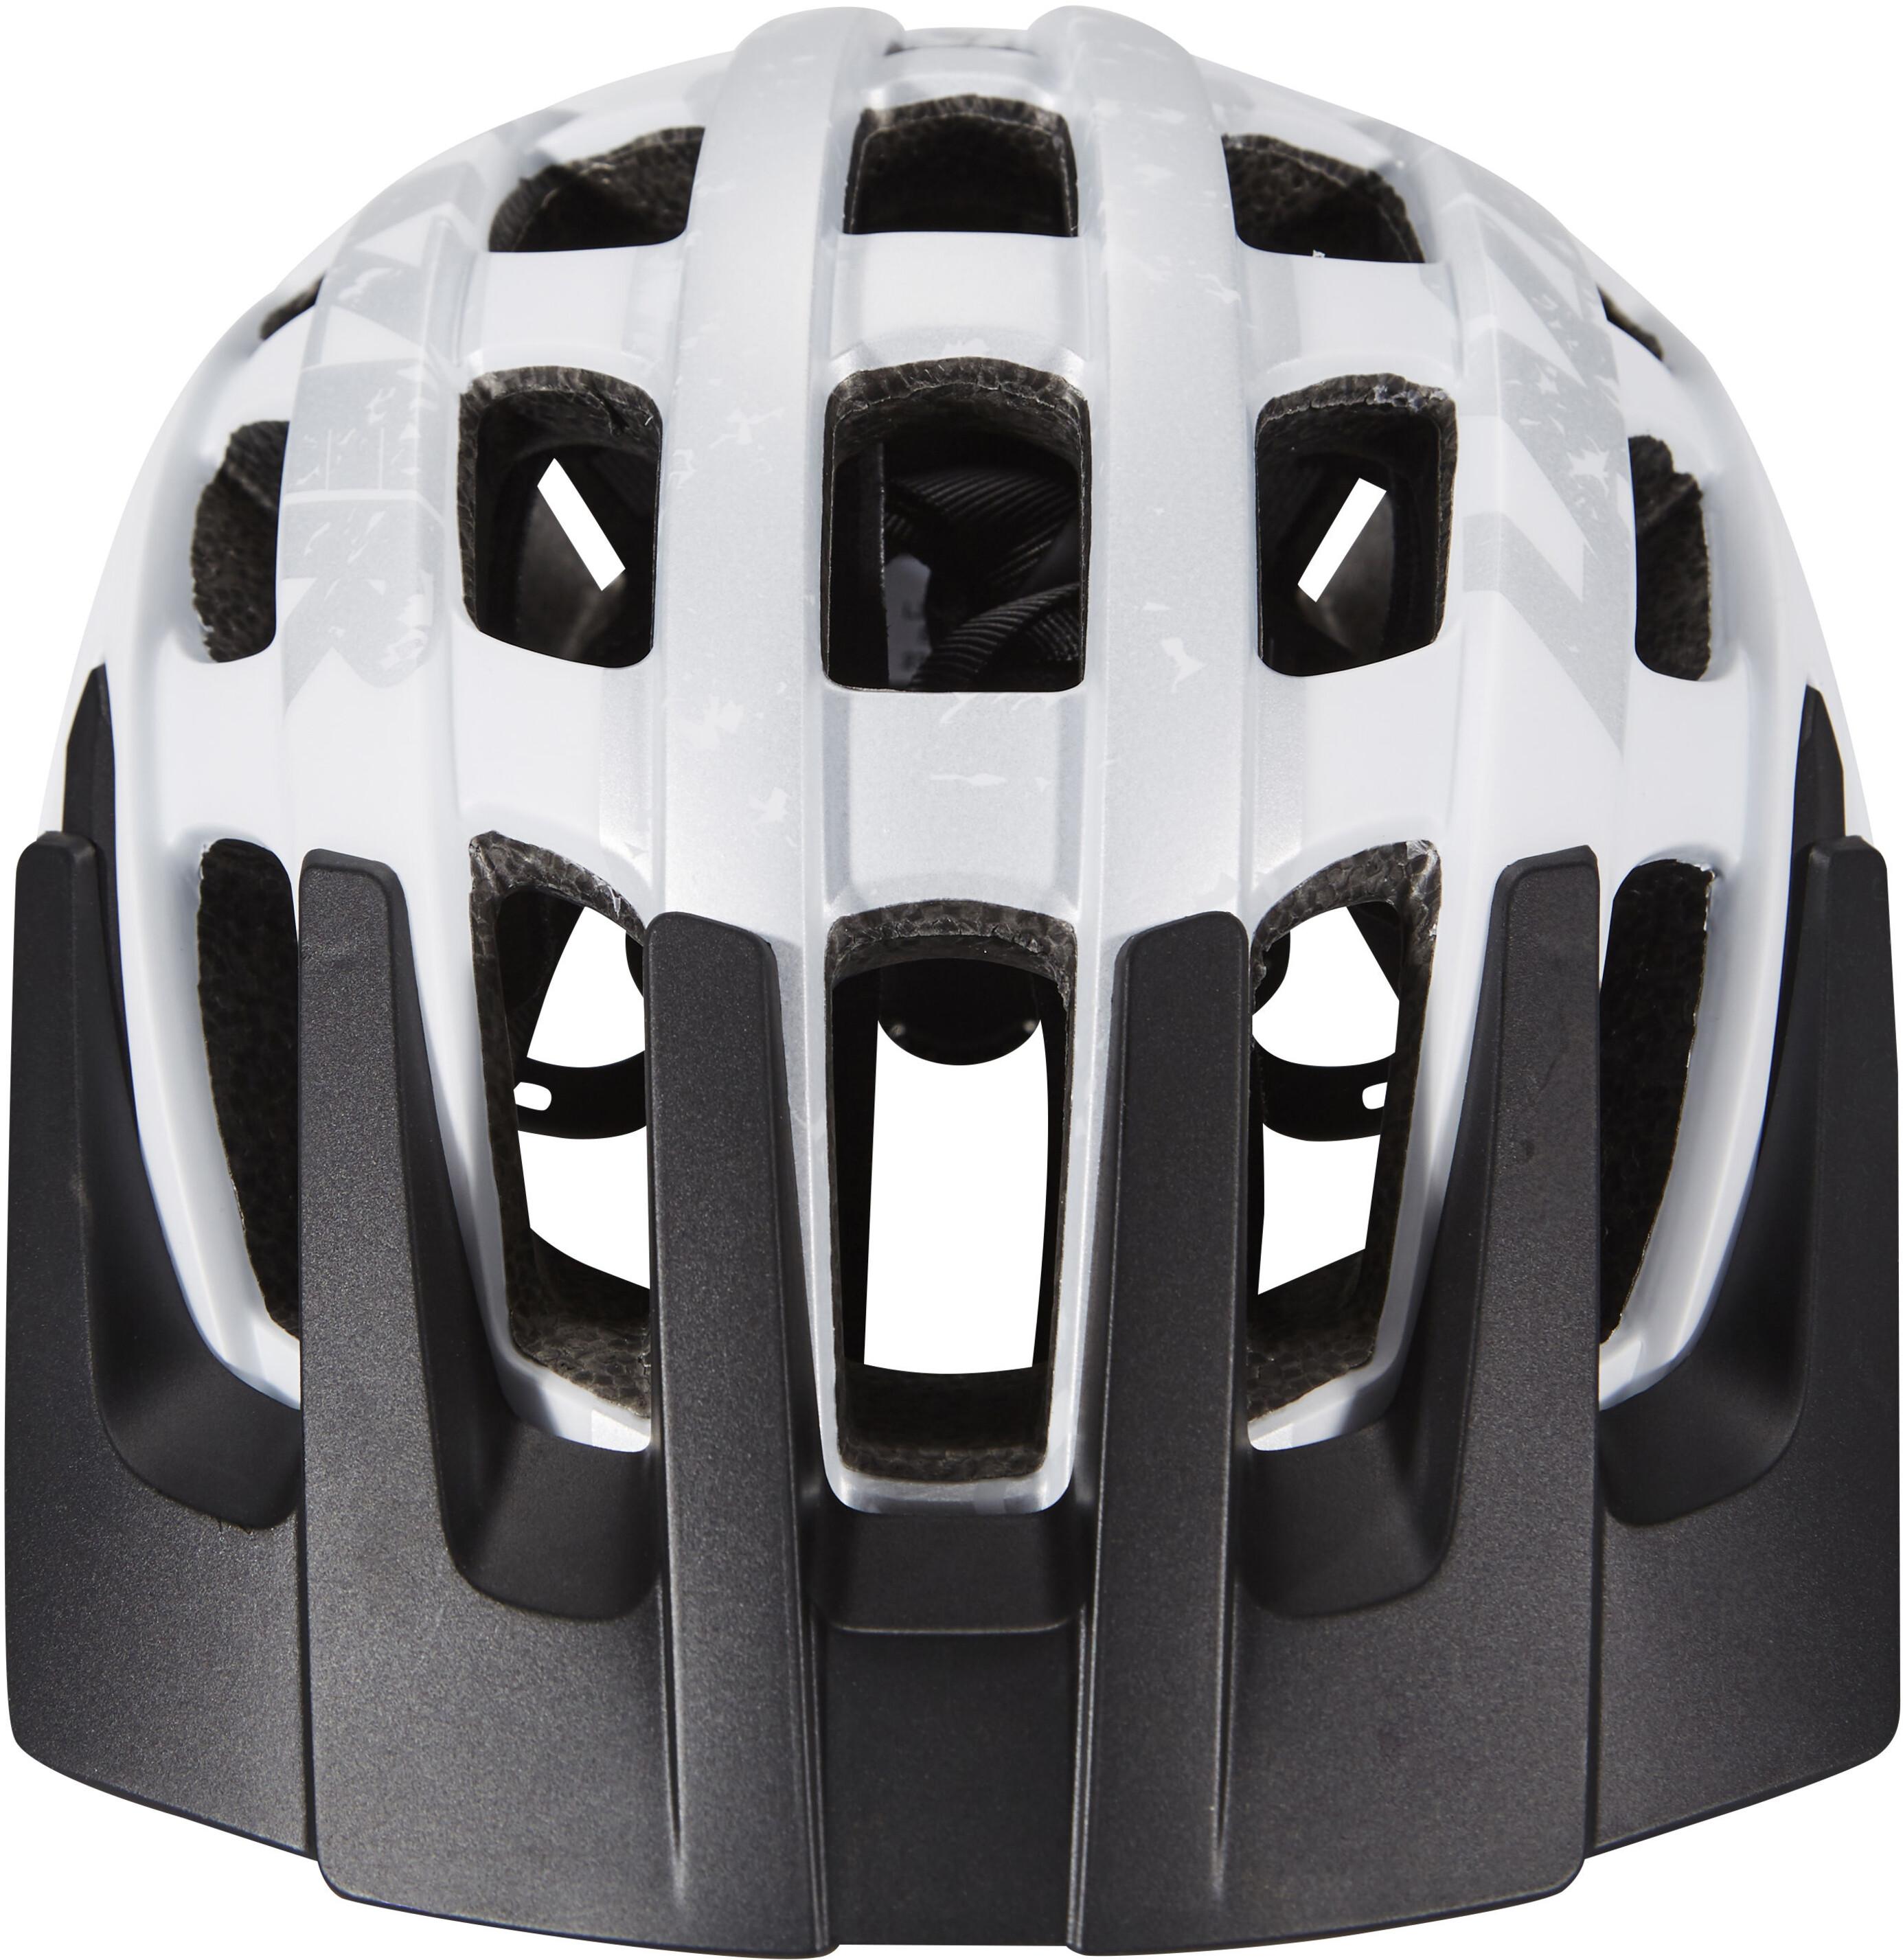 lazer roller helmet white silver mat g nstig kaufen. Black Bedroom Furniture Sets. Home Design Ideas